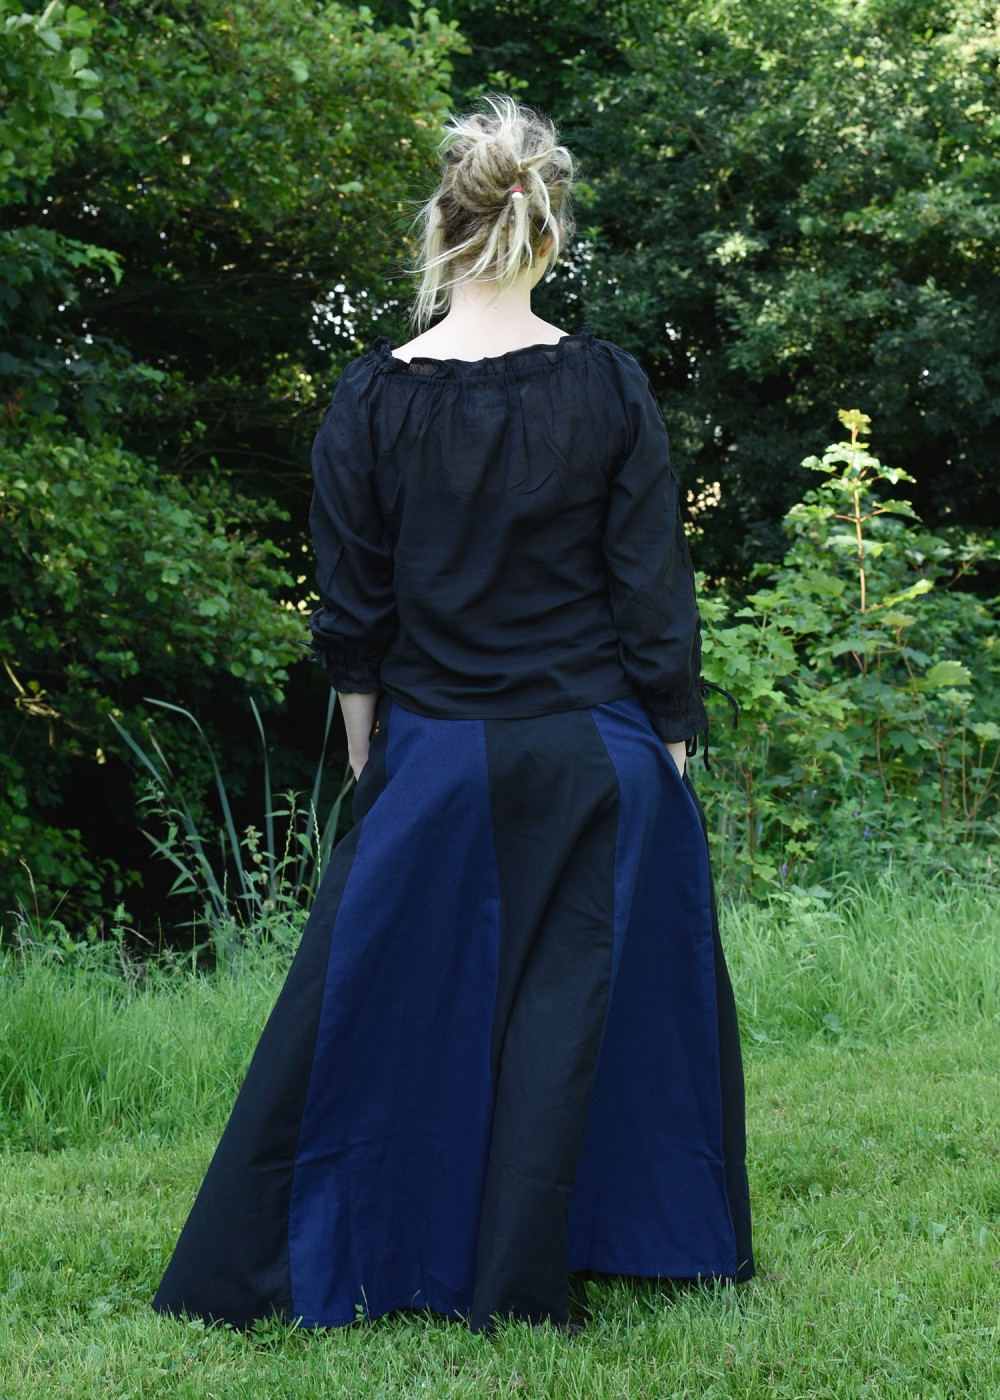 Medieval Ladies skirt, black/blue - Battle-Merchant.com - We supply ...